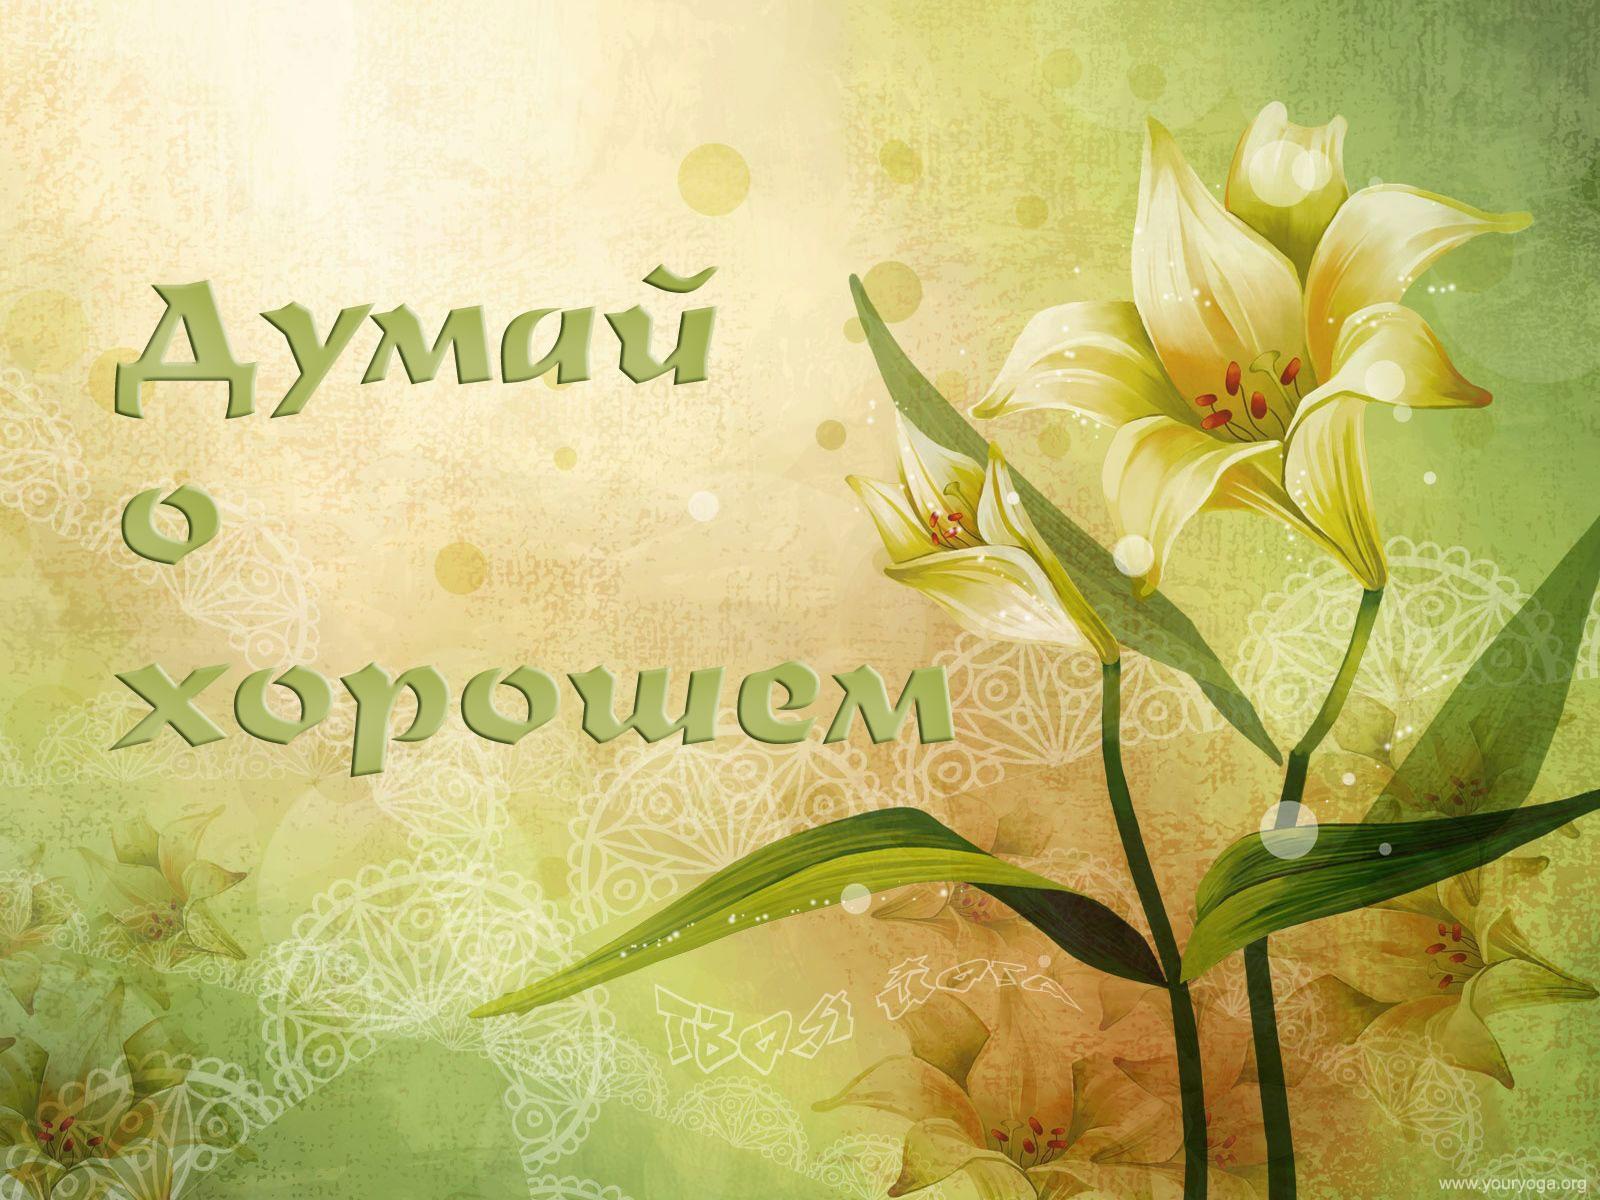 http://photo.youryoga.org/desk/image/youryoga134.jpg